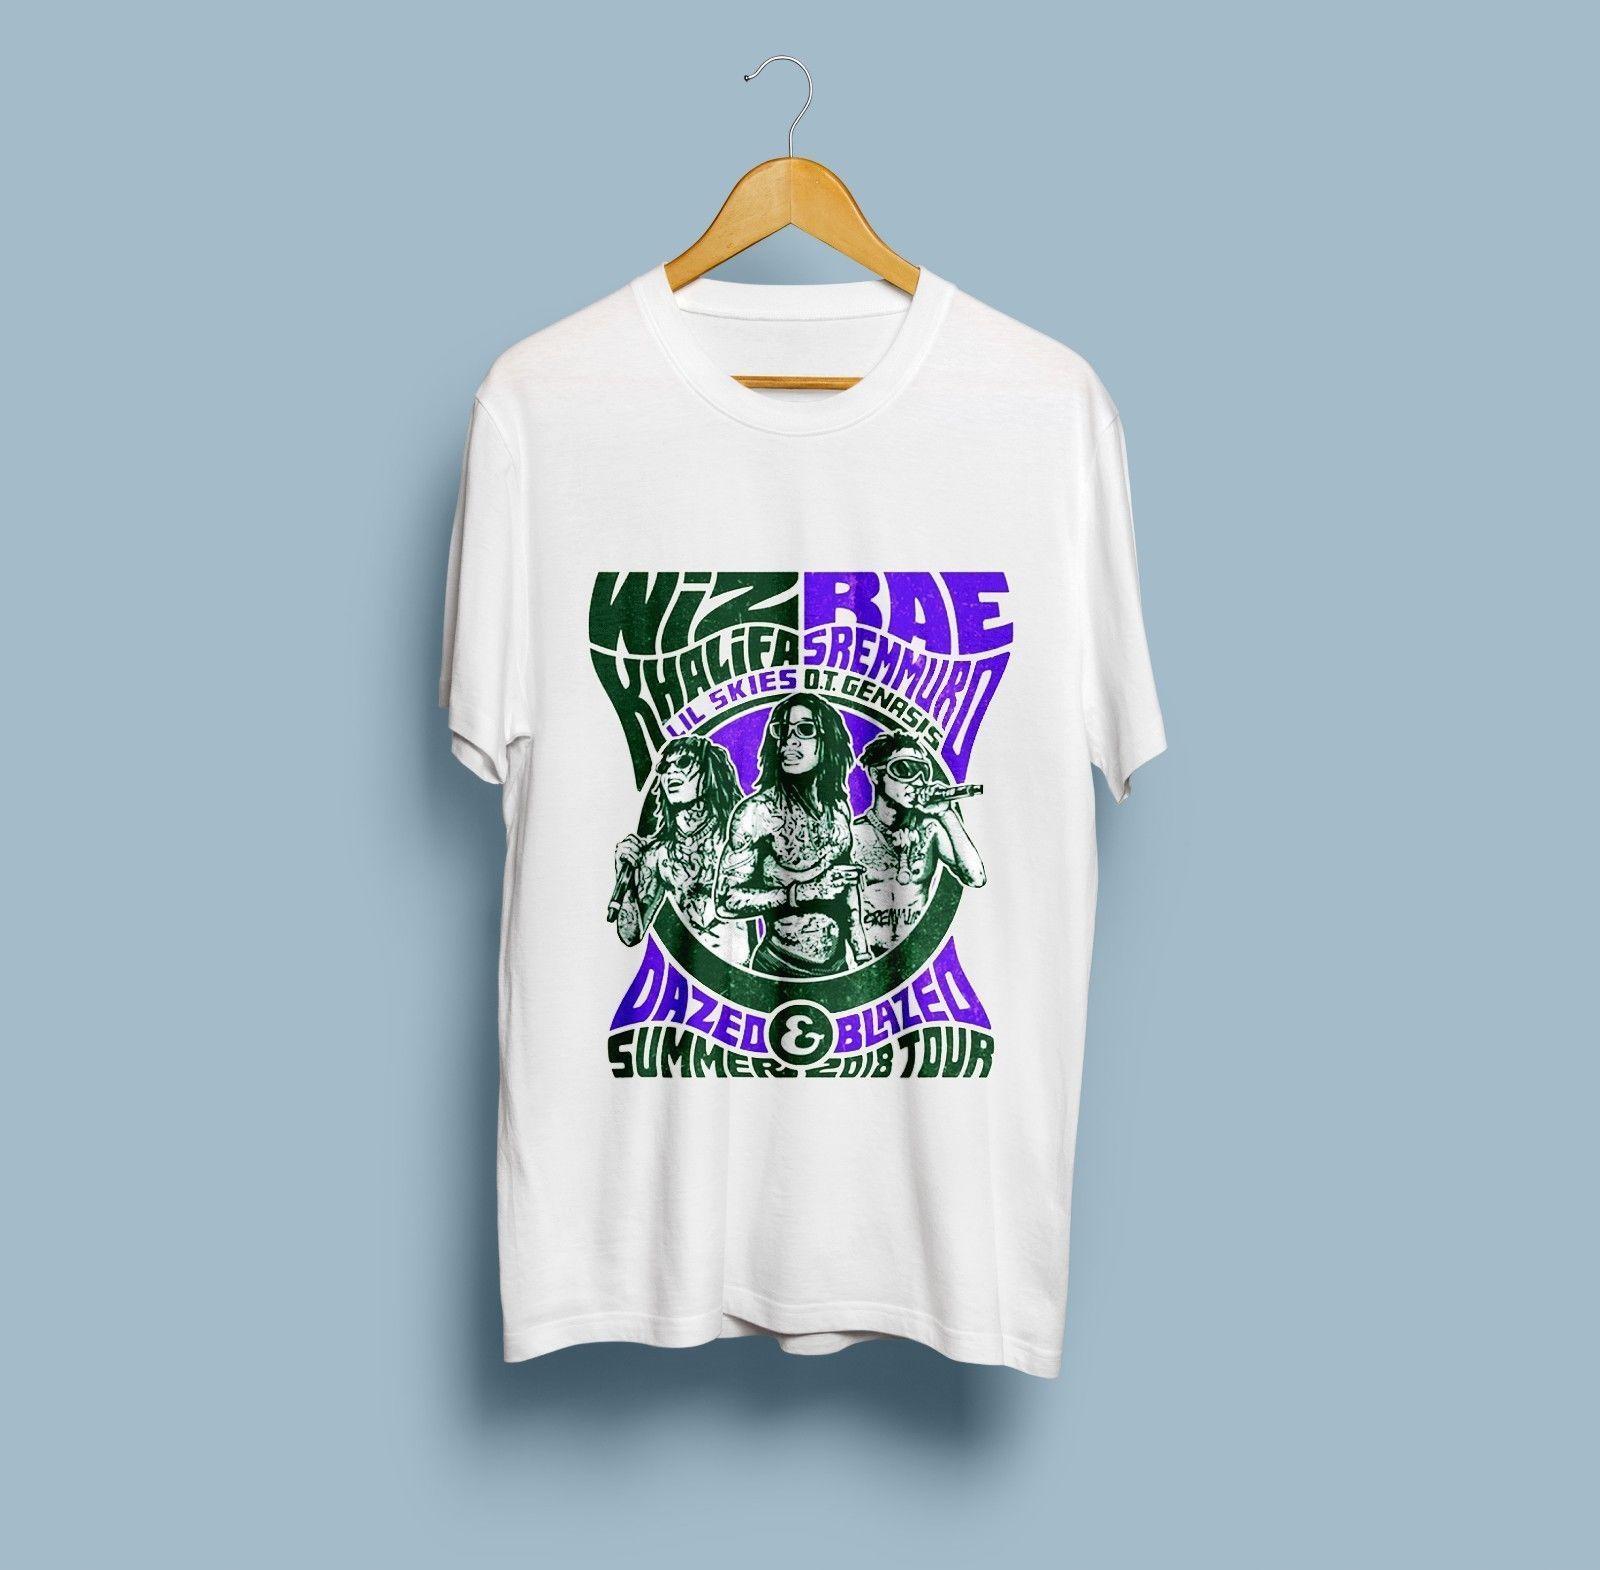 Raro Wiz Rae Khalifa Sremmurd Dazed Blazed verano 2018 Tour camiseta nueva impresión camiseta hombres camiseta destacada de talla grande Harajuku